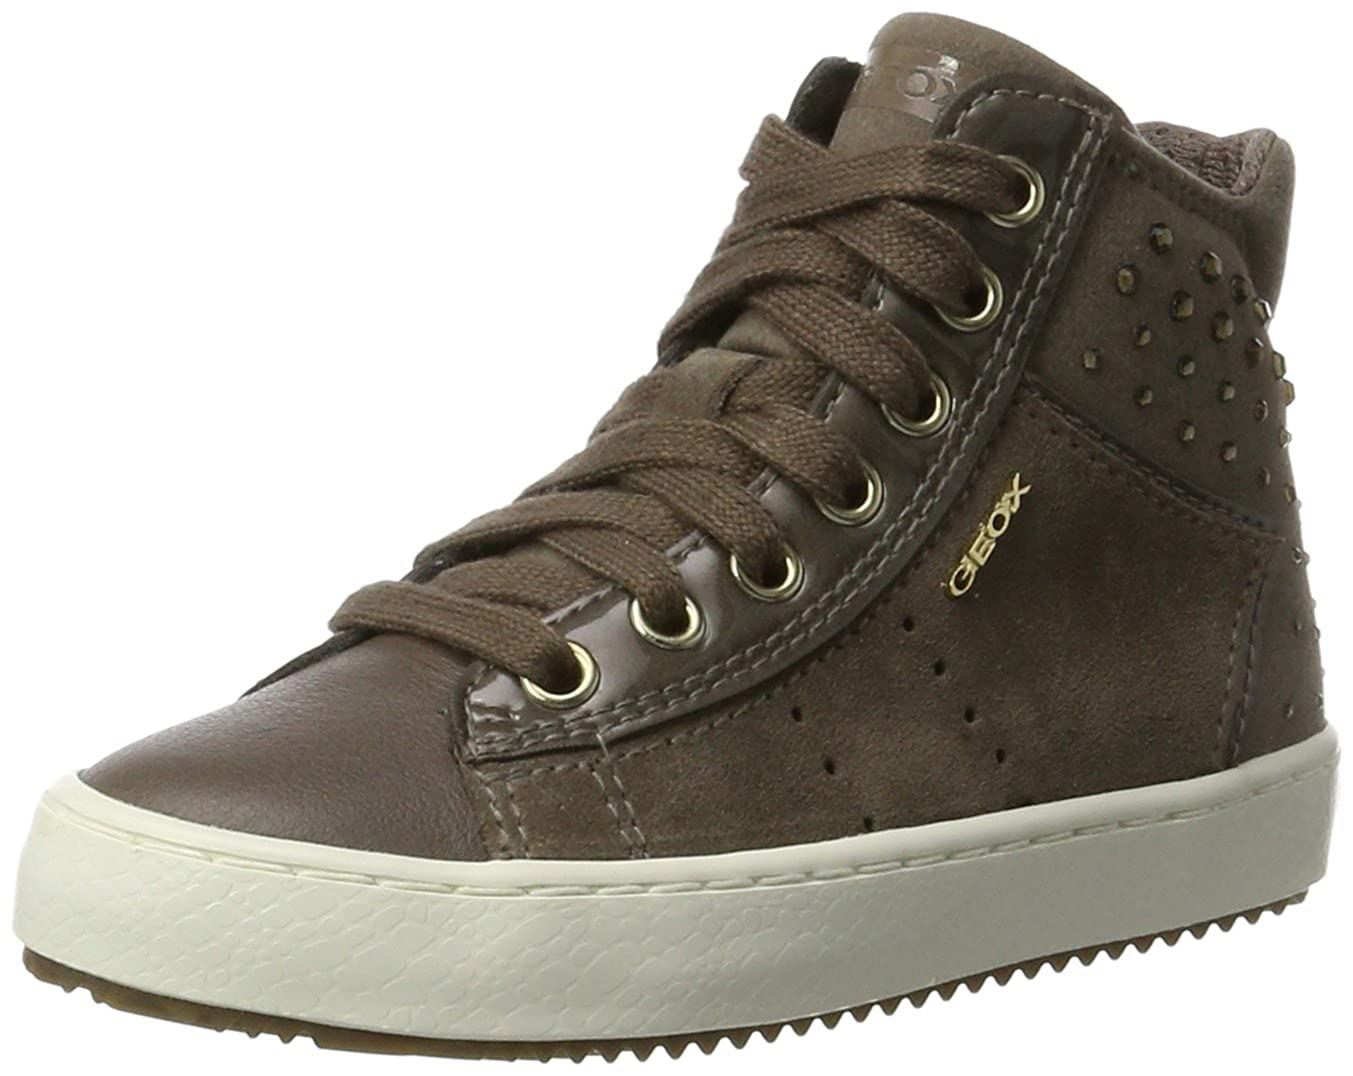 9e15a89301f54a Geox J Kalispera Girl E Hi-Top Trainers: Amazon.co.uk: Shoes & Bags